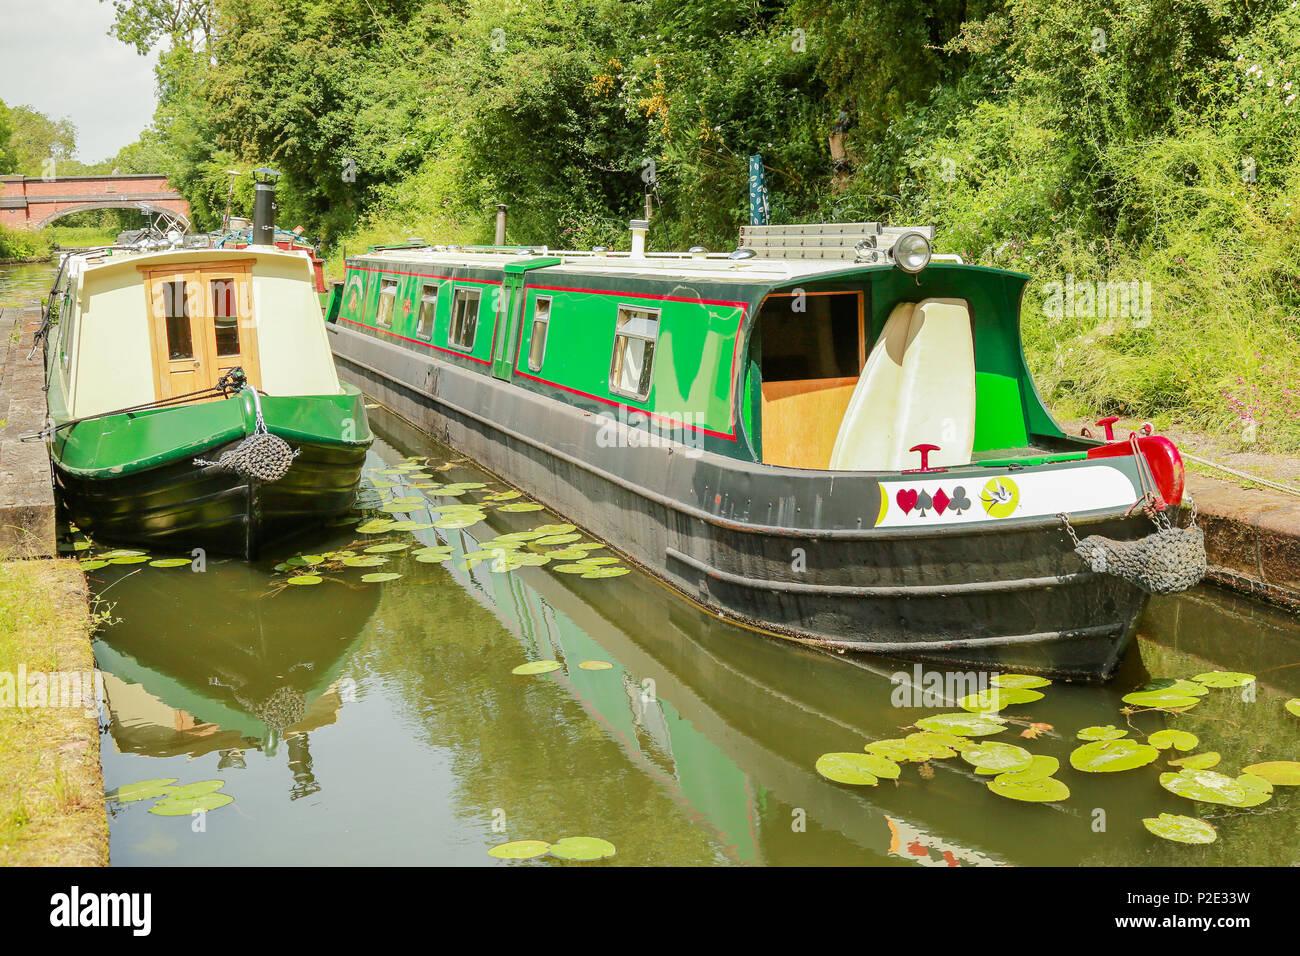 Canal boats at Foxton Locks cana basin - Stock Image